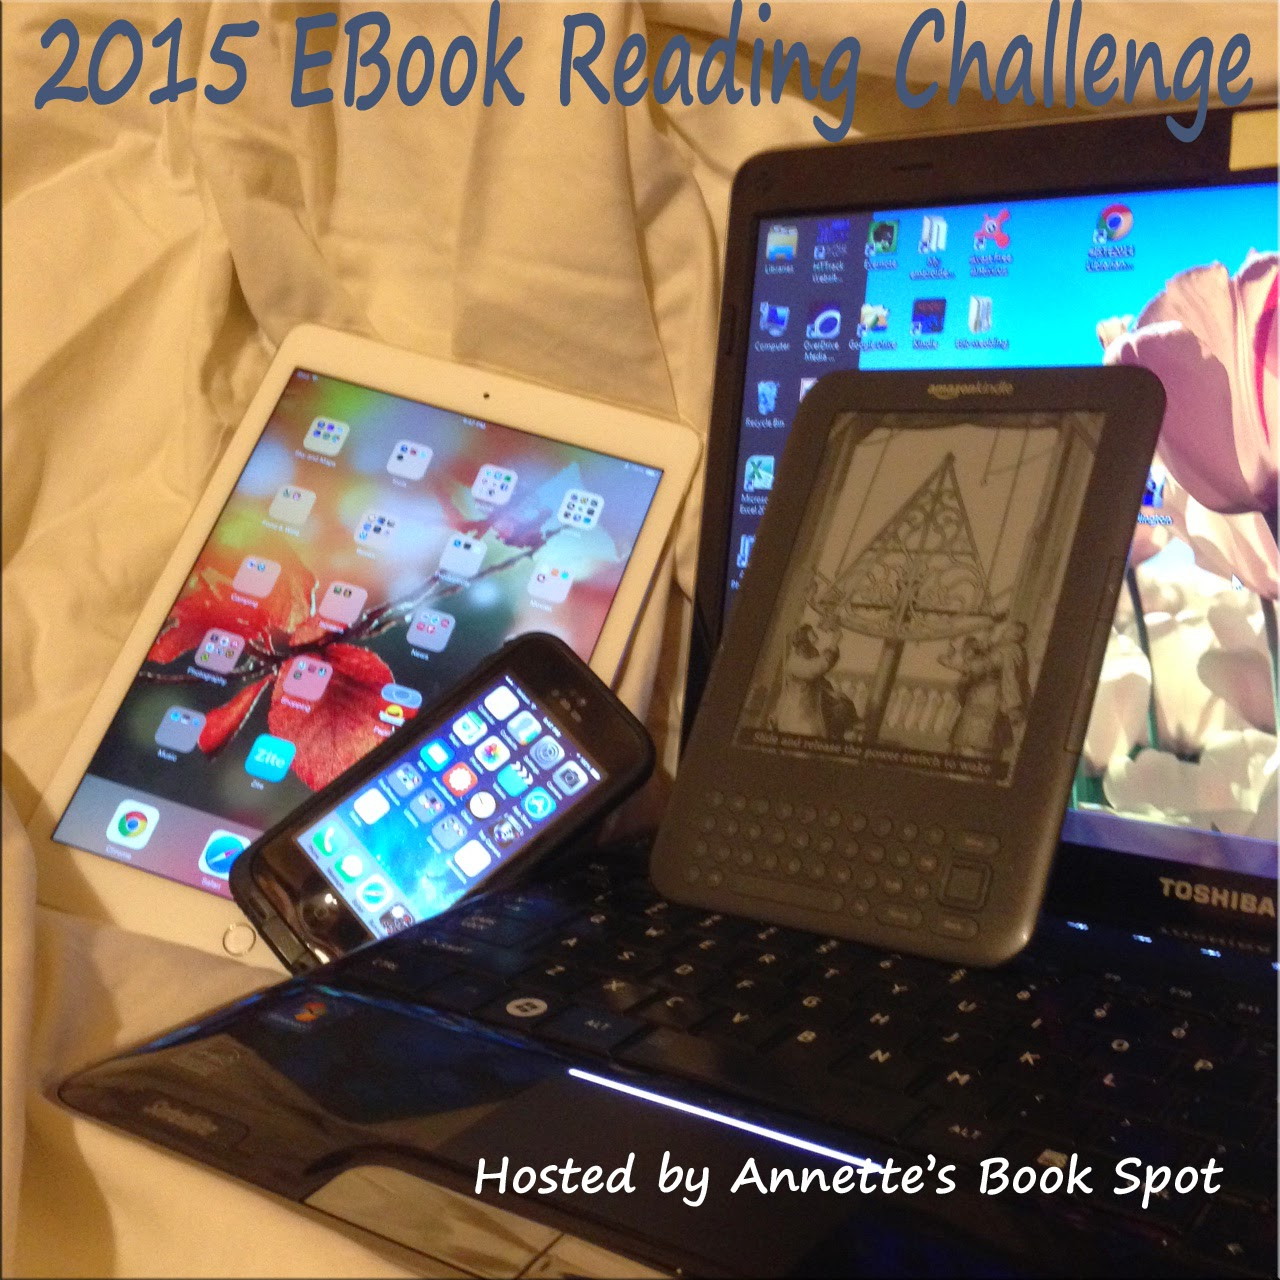 Sign up for 2015 EBook Challenge